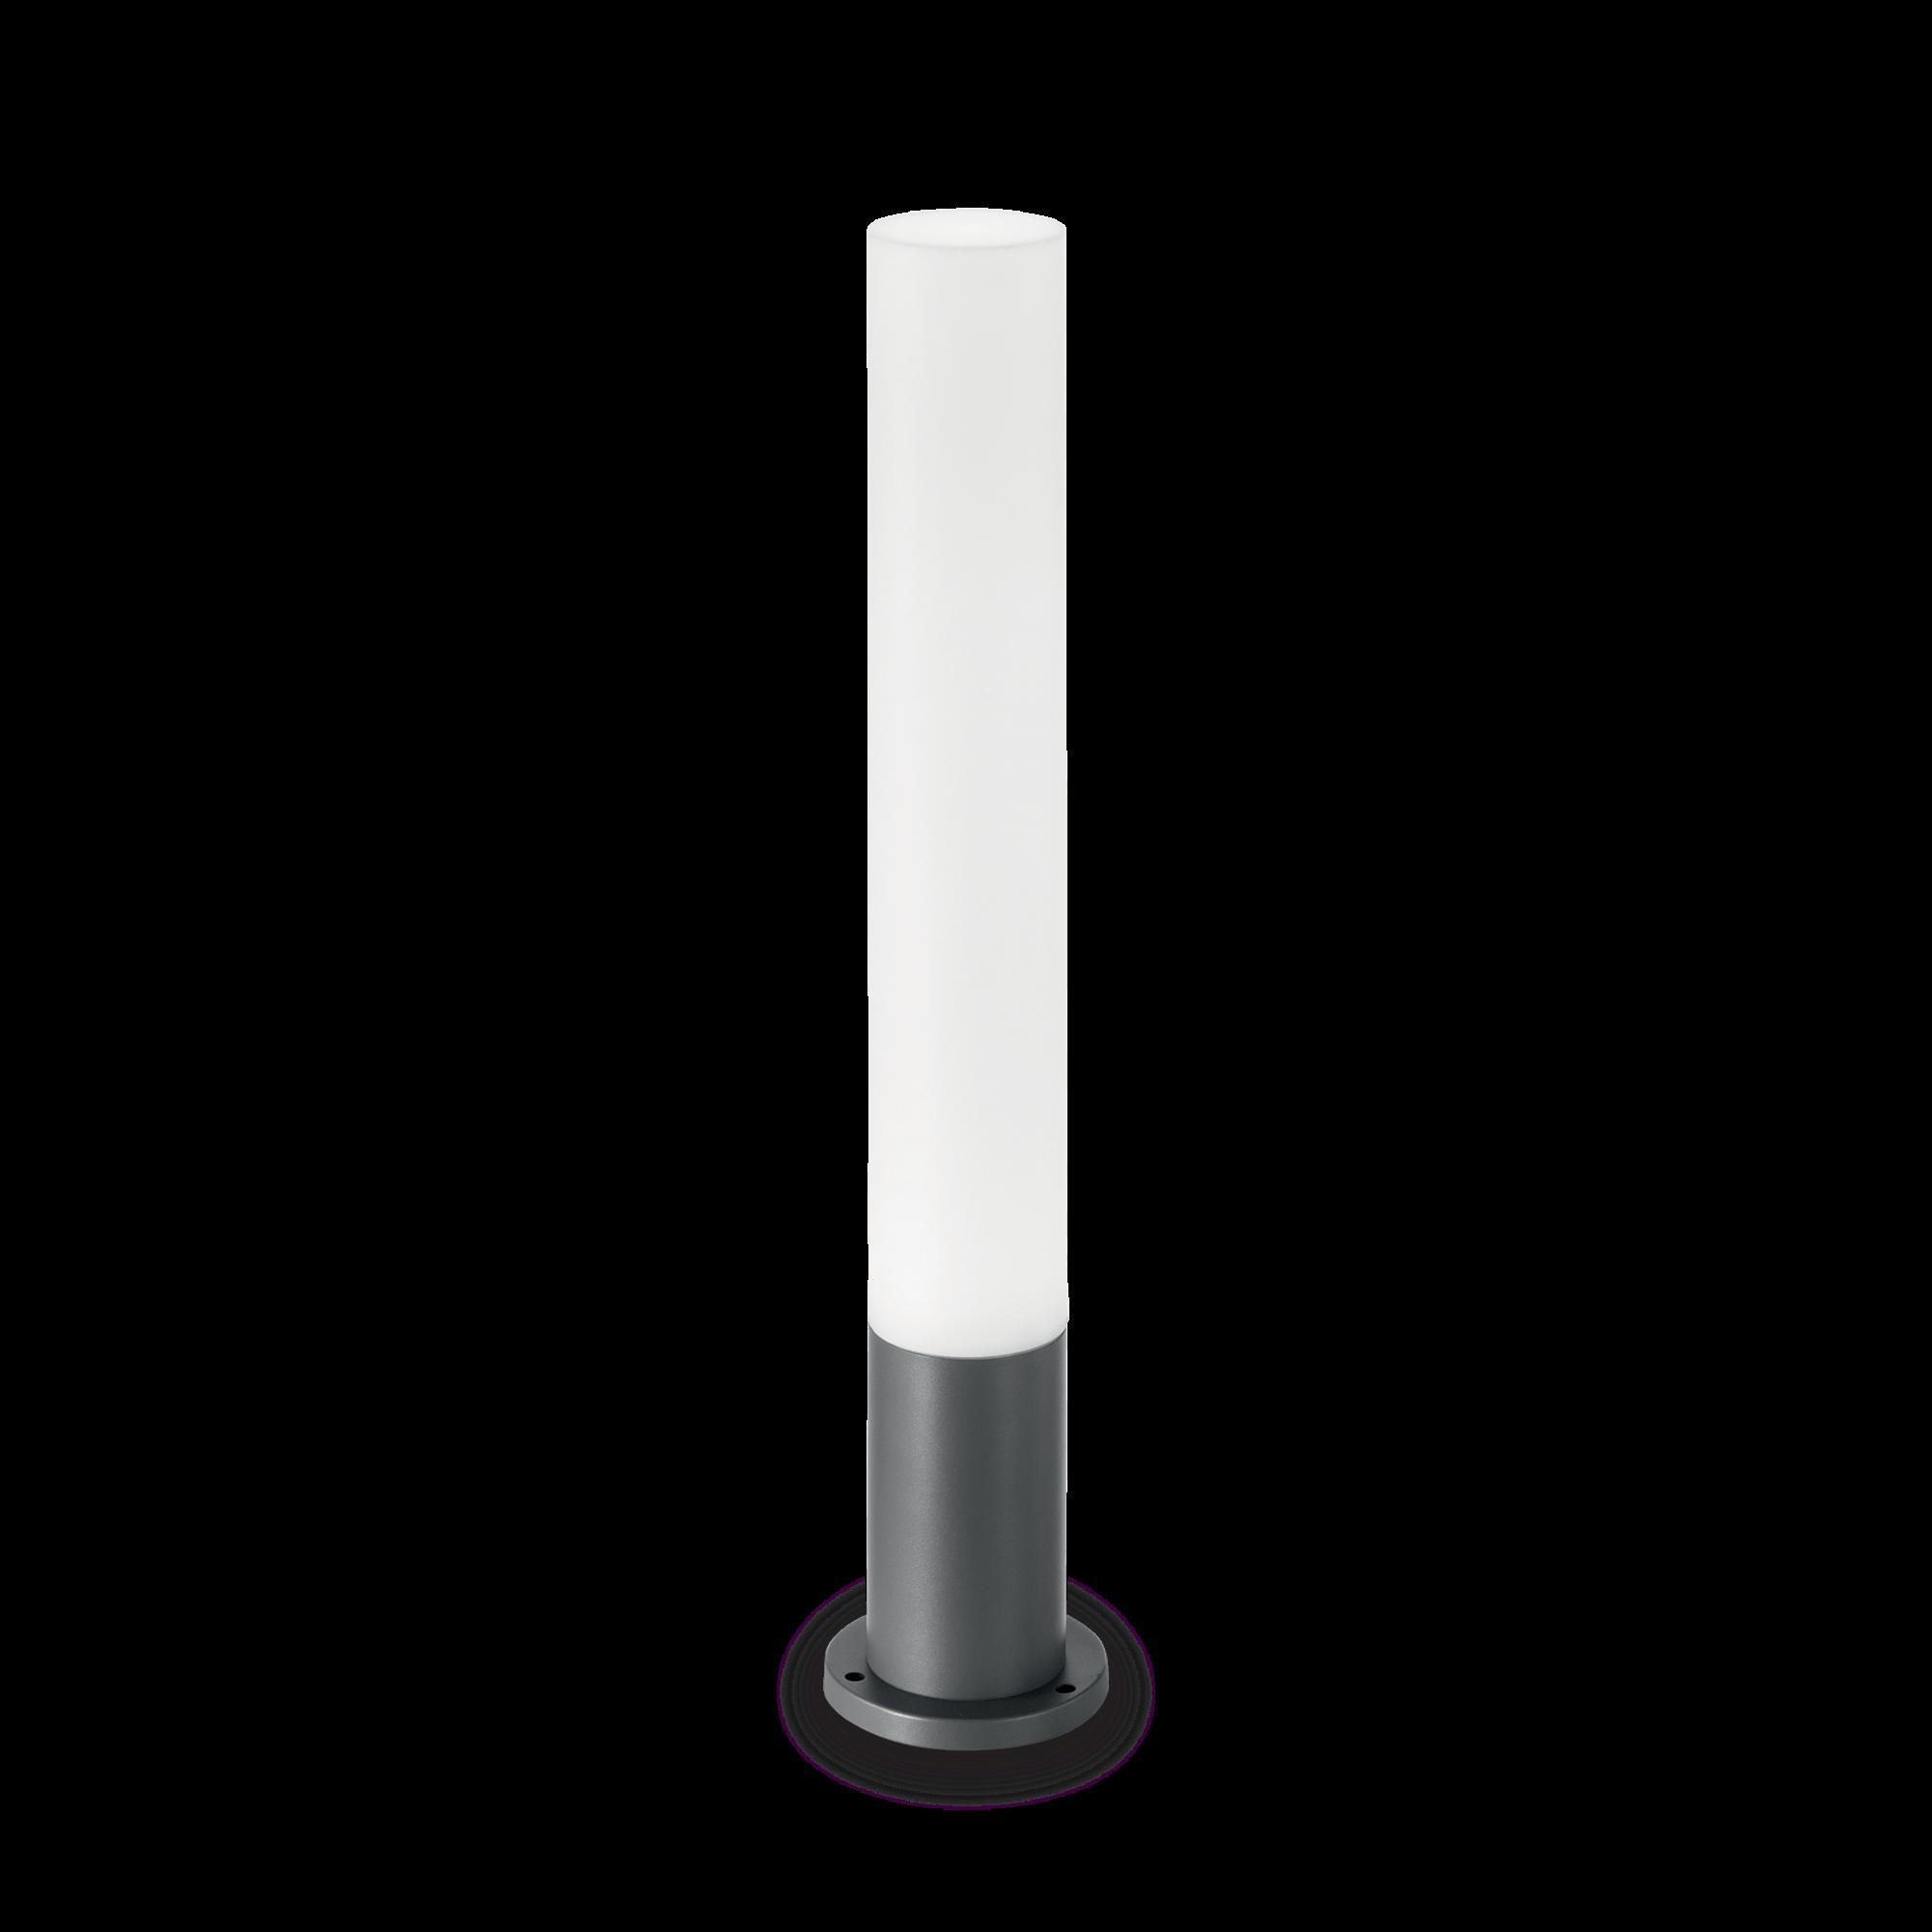 Ideal Lux 138510 Edo Outdoor PT1 Round Antracite kültéri állólámpa